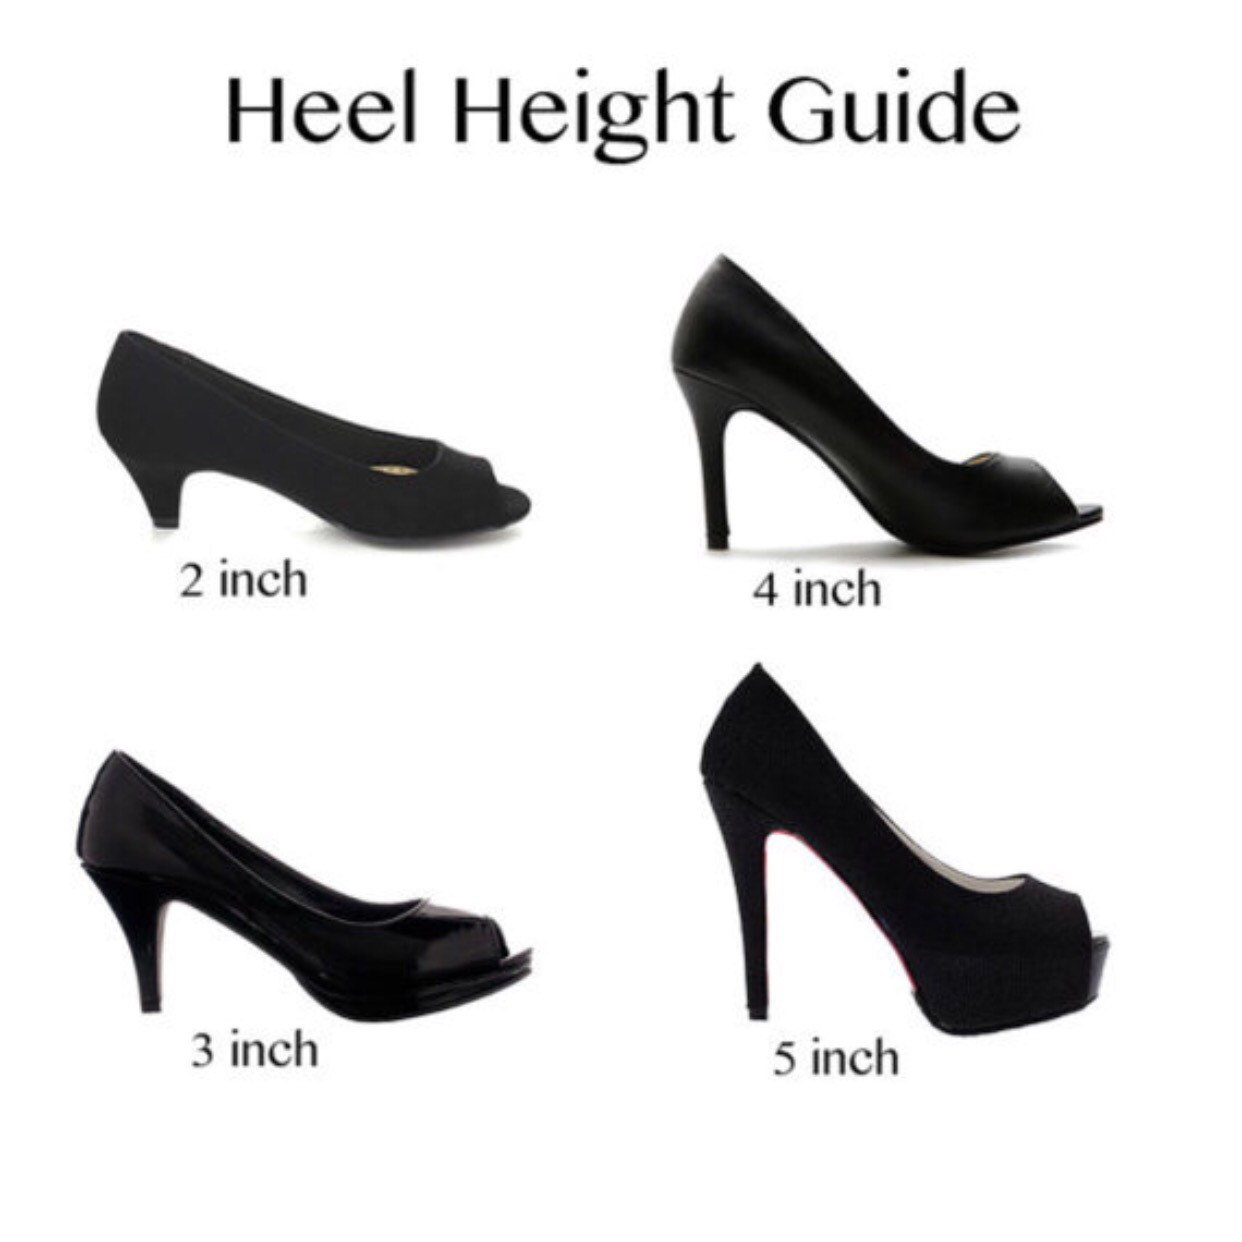 cee1b827819 Glitter High Heels - Navy Blue and Silver Peep Toe Pumps - Wedding ...